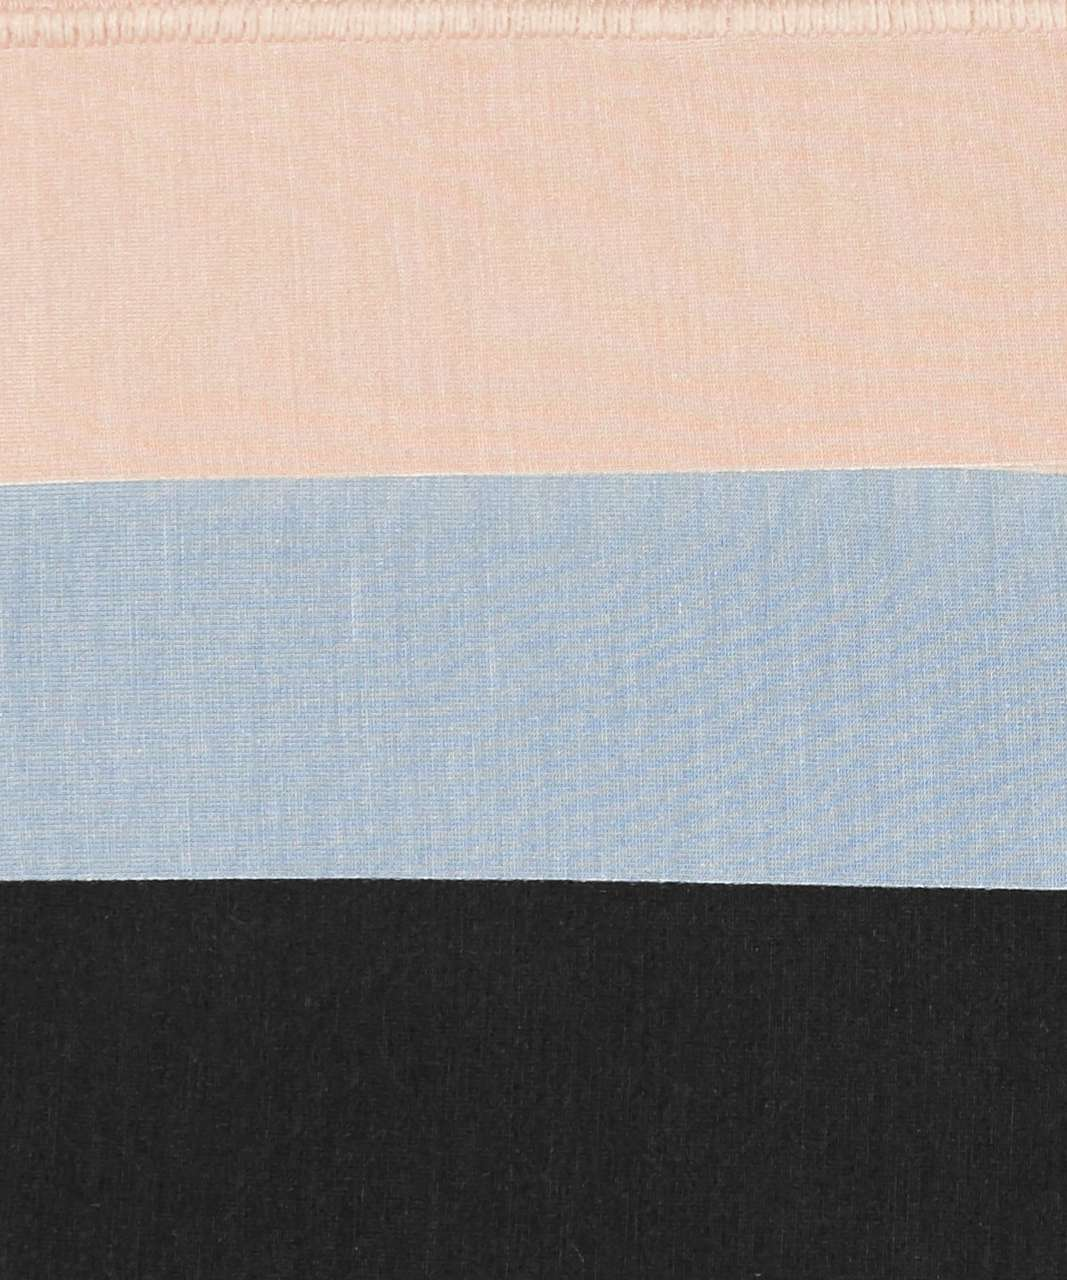 Lululemon Mula Bandhawear Thong *3 Pack - Chambray / Crepe / Black